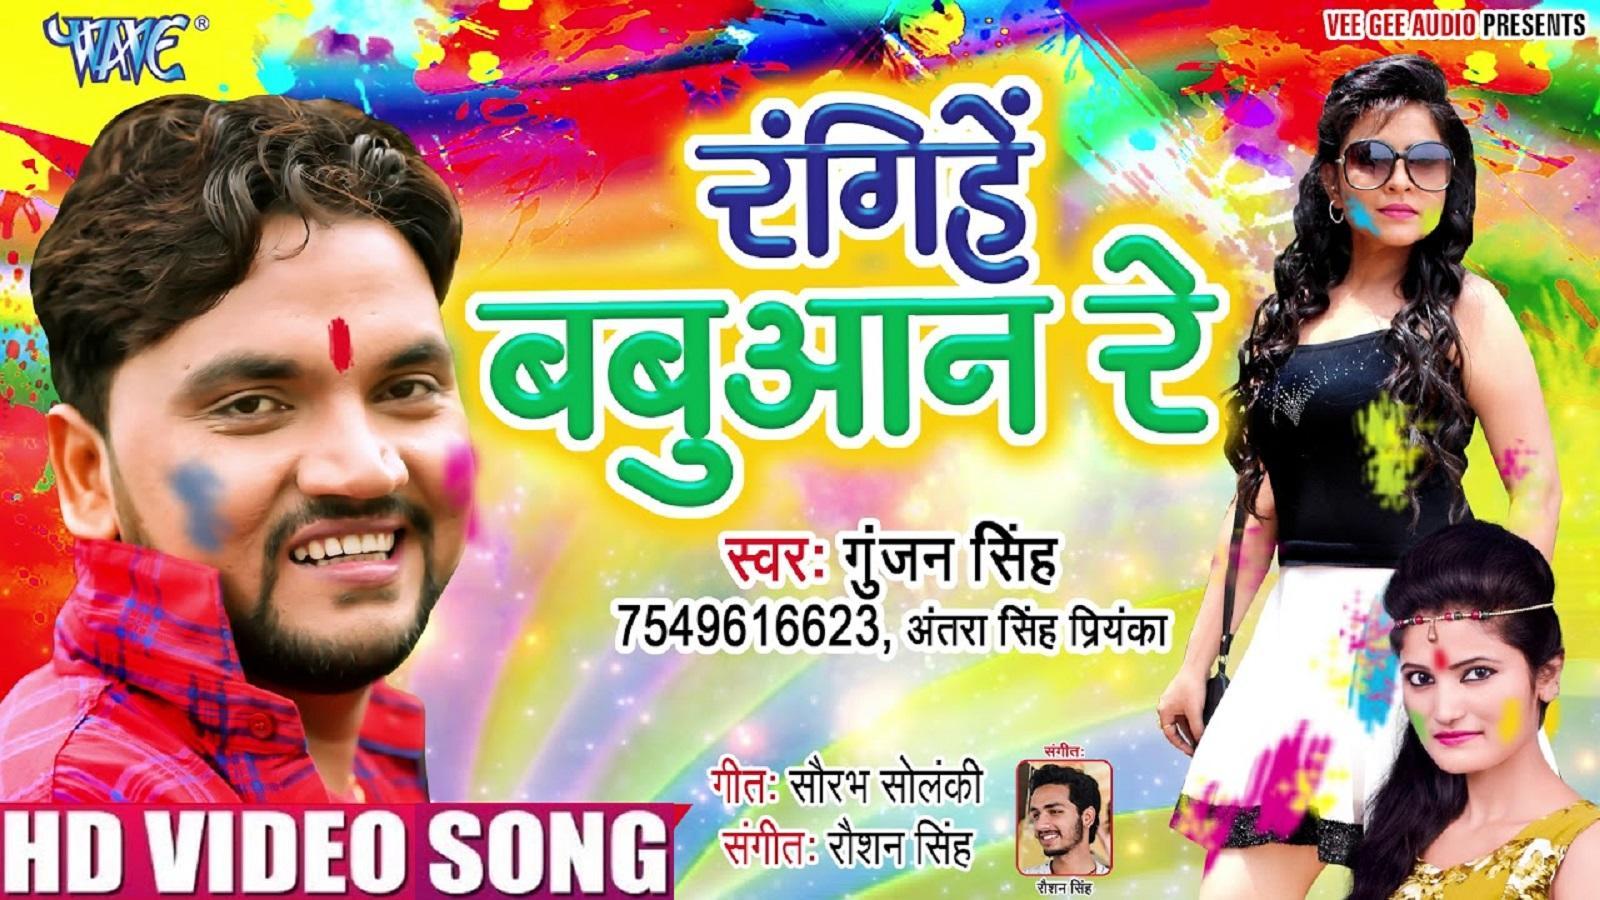 Watch Bhojpuri Song Gunjan Singh And Antra Singh Priyanka S Bhojpuri Gana Video Song Rangihe Babuan Re